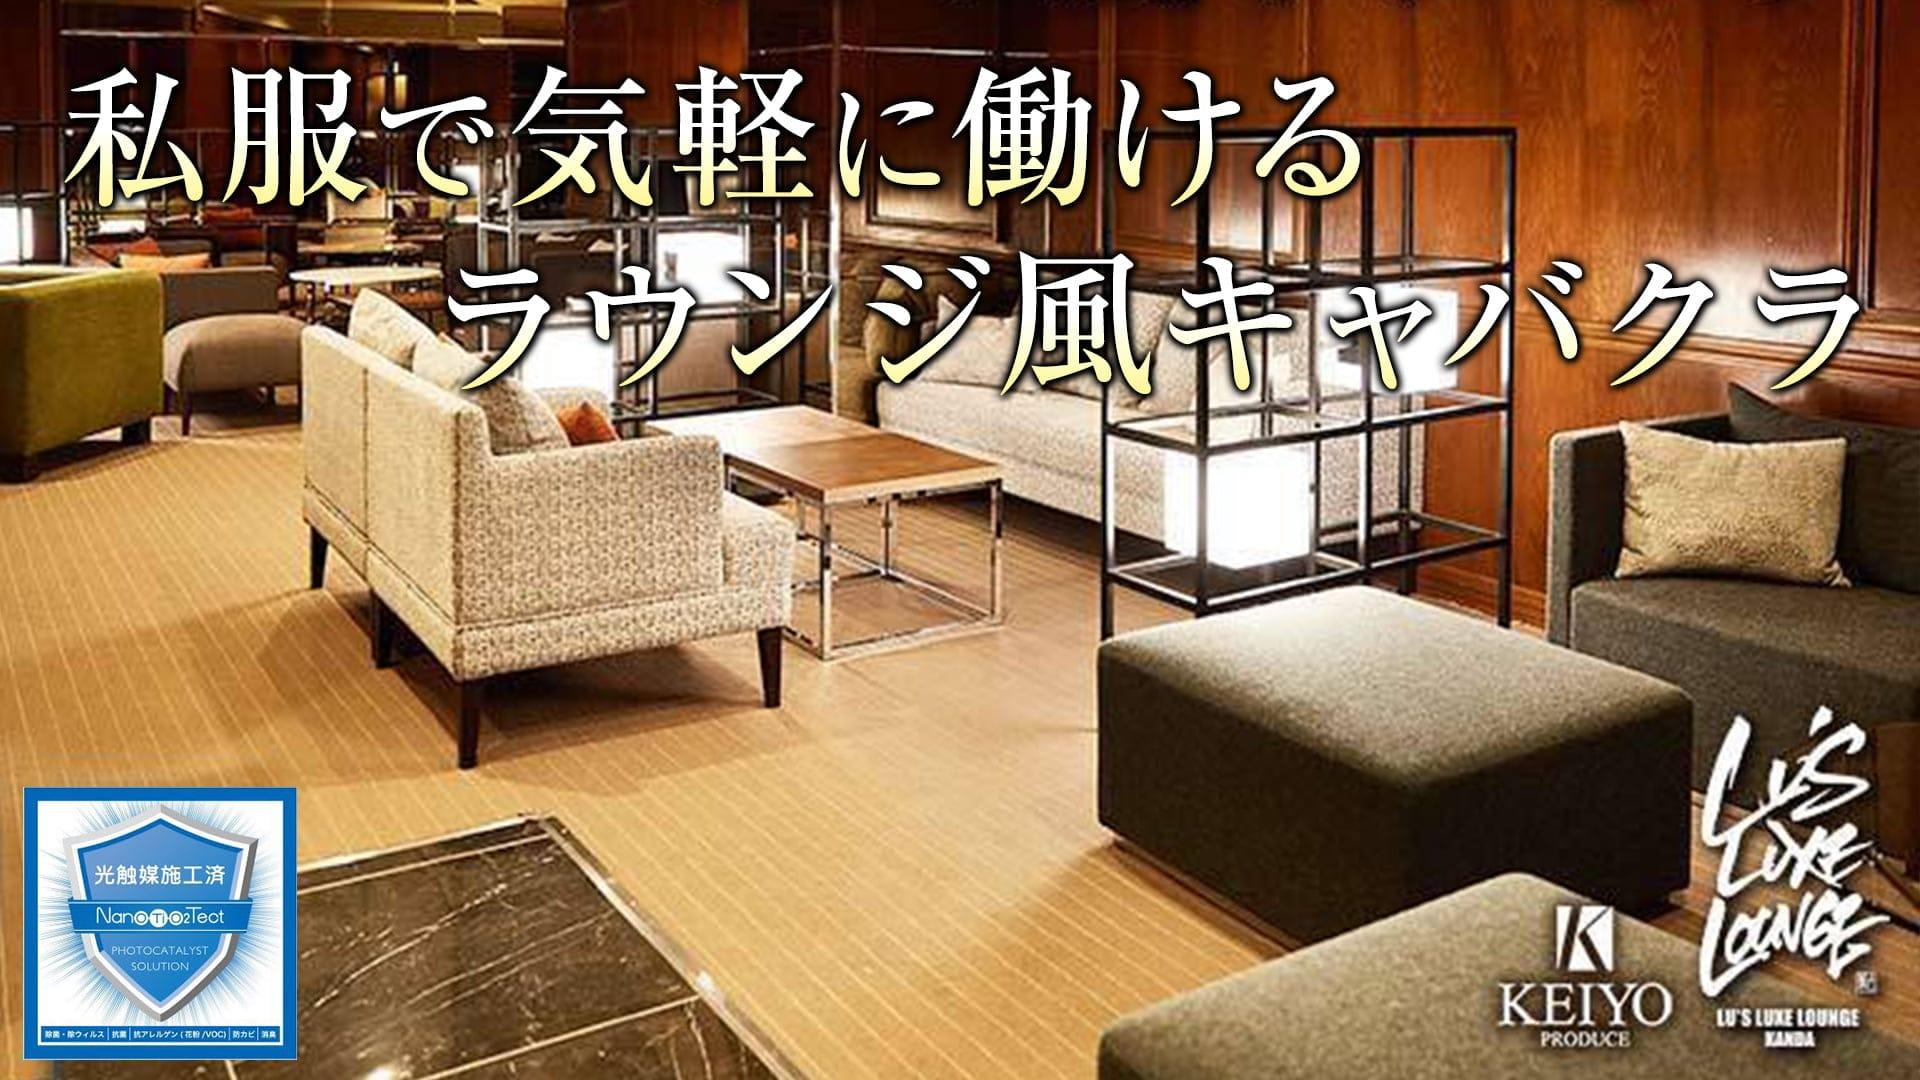 Lu's Luxe Lounge(ルーズリュクスラウンジ)【公式求人・体入情報】 神田キャバクラ TOP画像